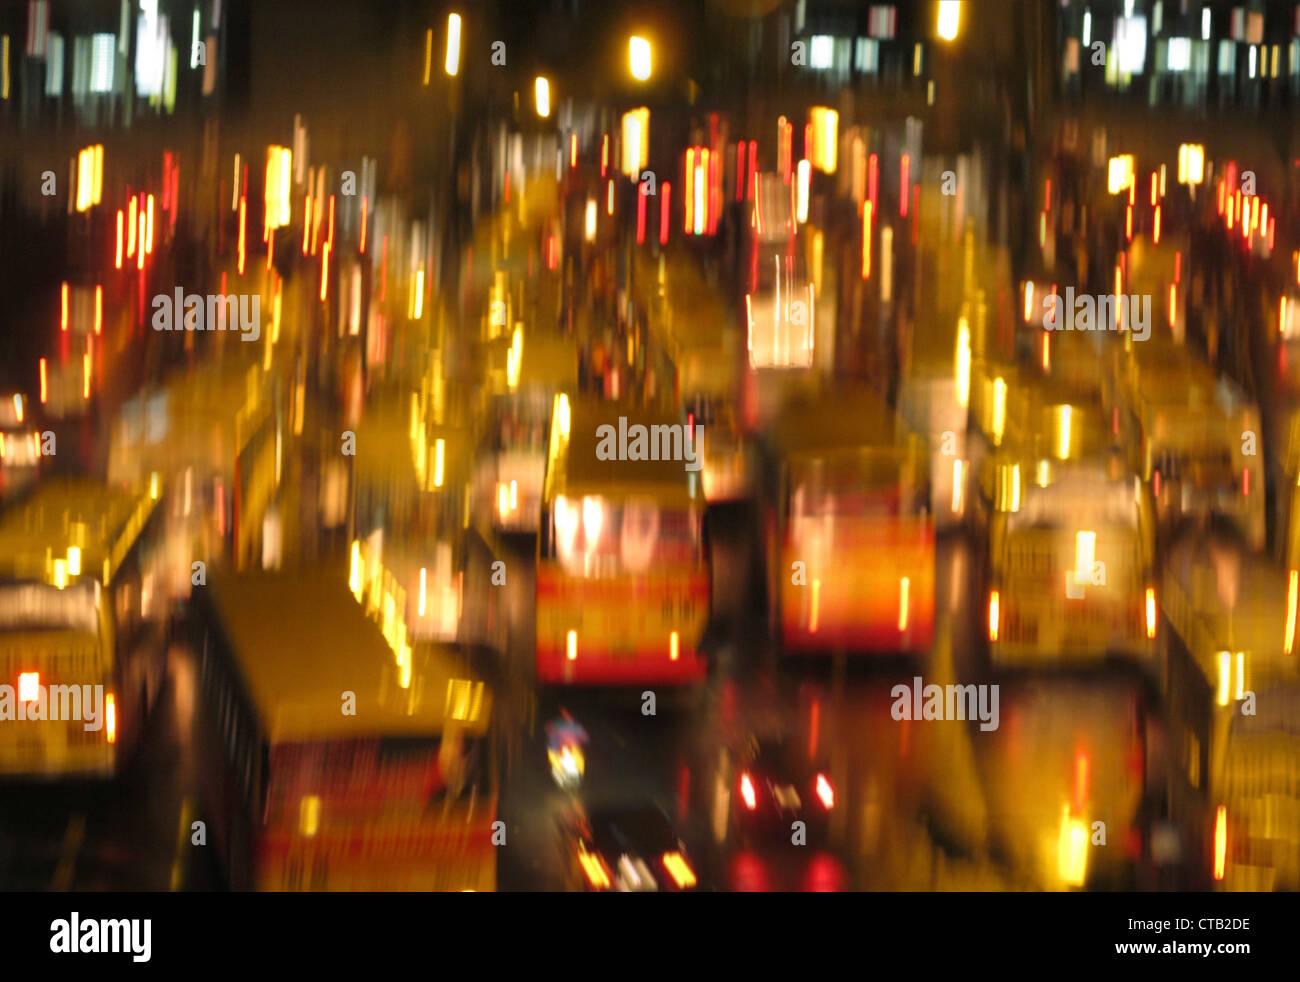 Verkehr in Edsa in Bewegung in der Nacht, Manila, Makati, Metro Manila, Insel Luzon, Philippinen, Asien Stockbild